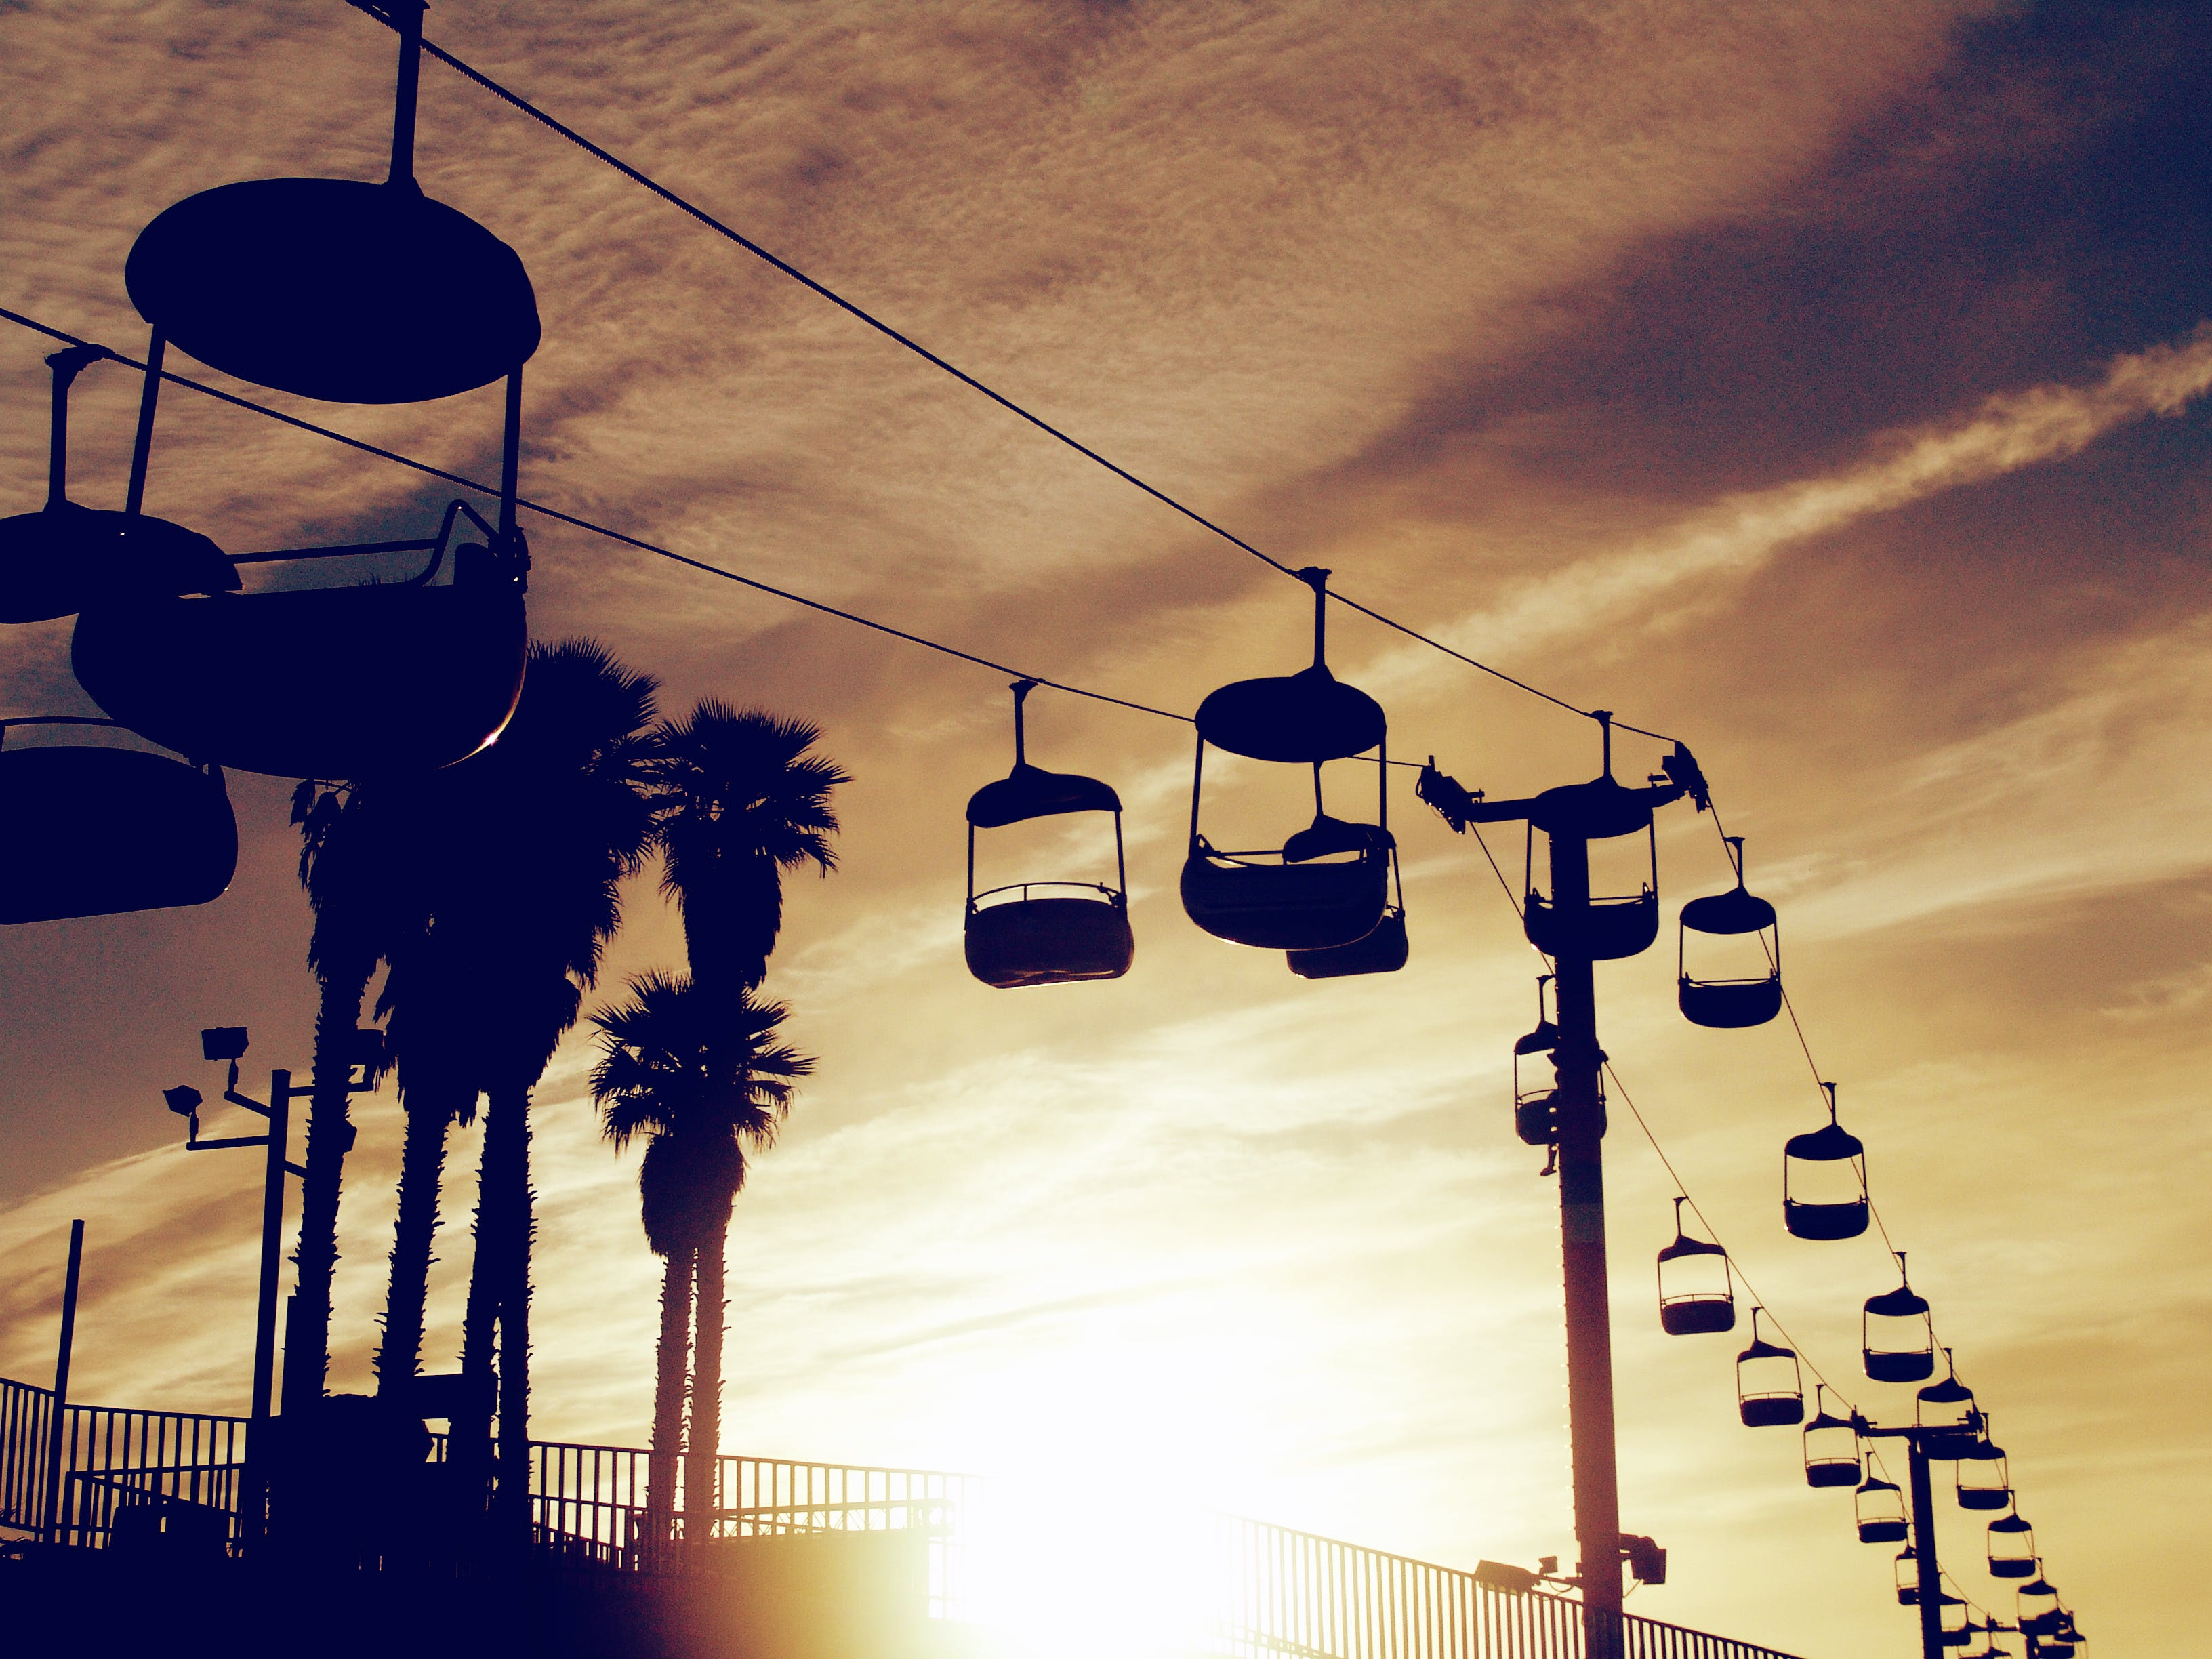 chairlift, dawn, dusk